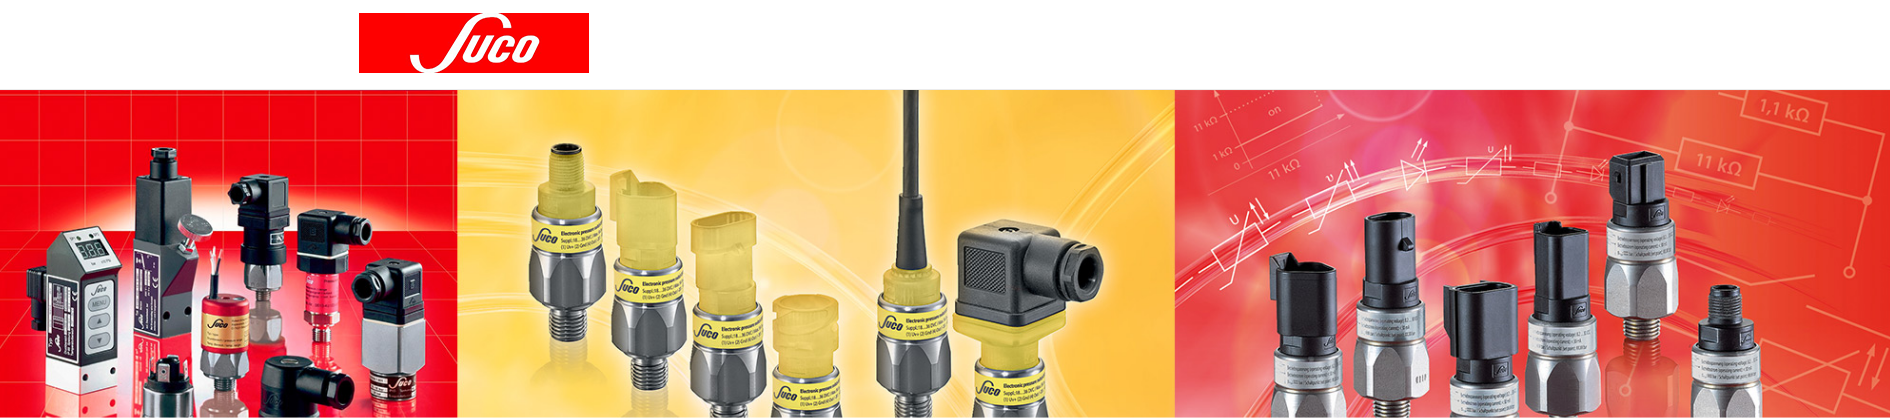 SUCO 苏克压力控制系统产品Pressure control system